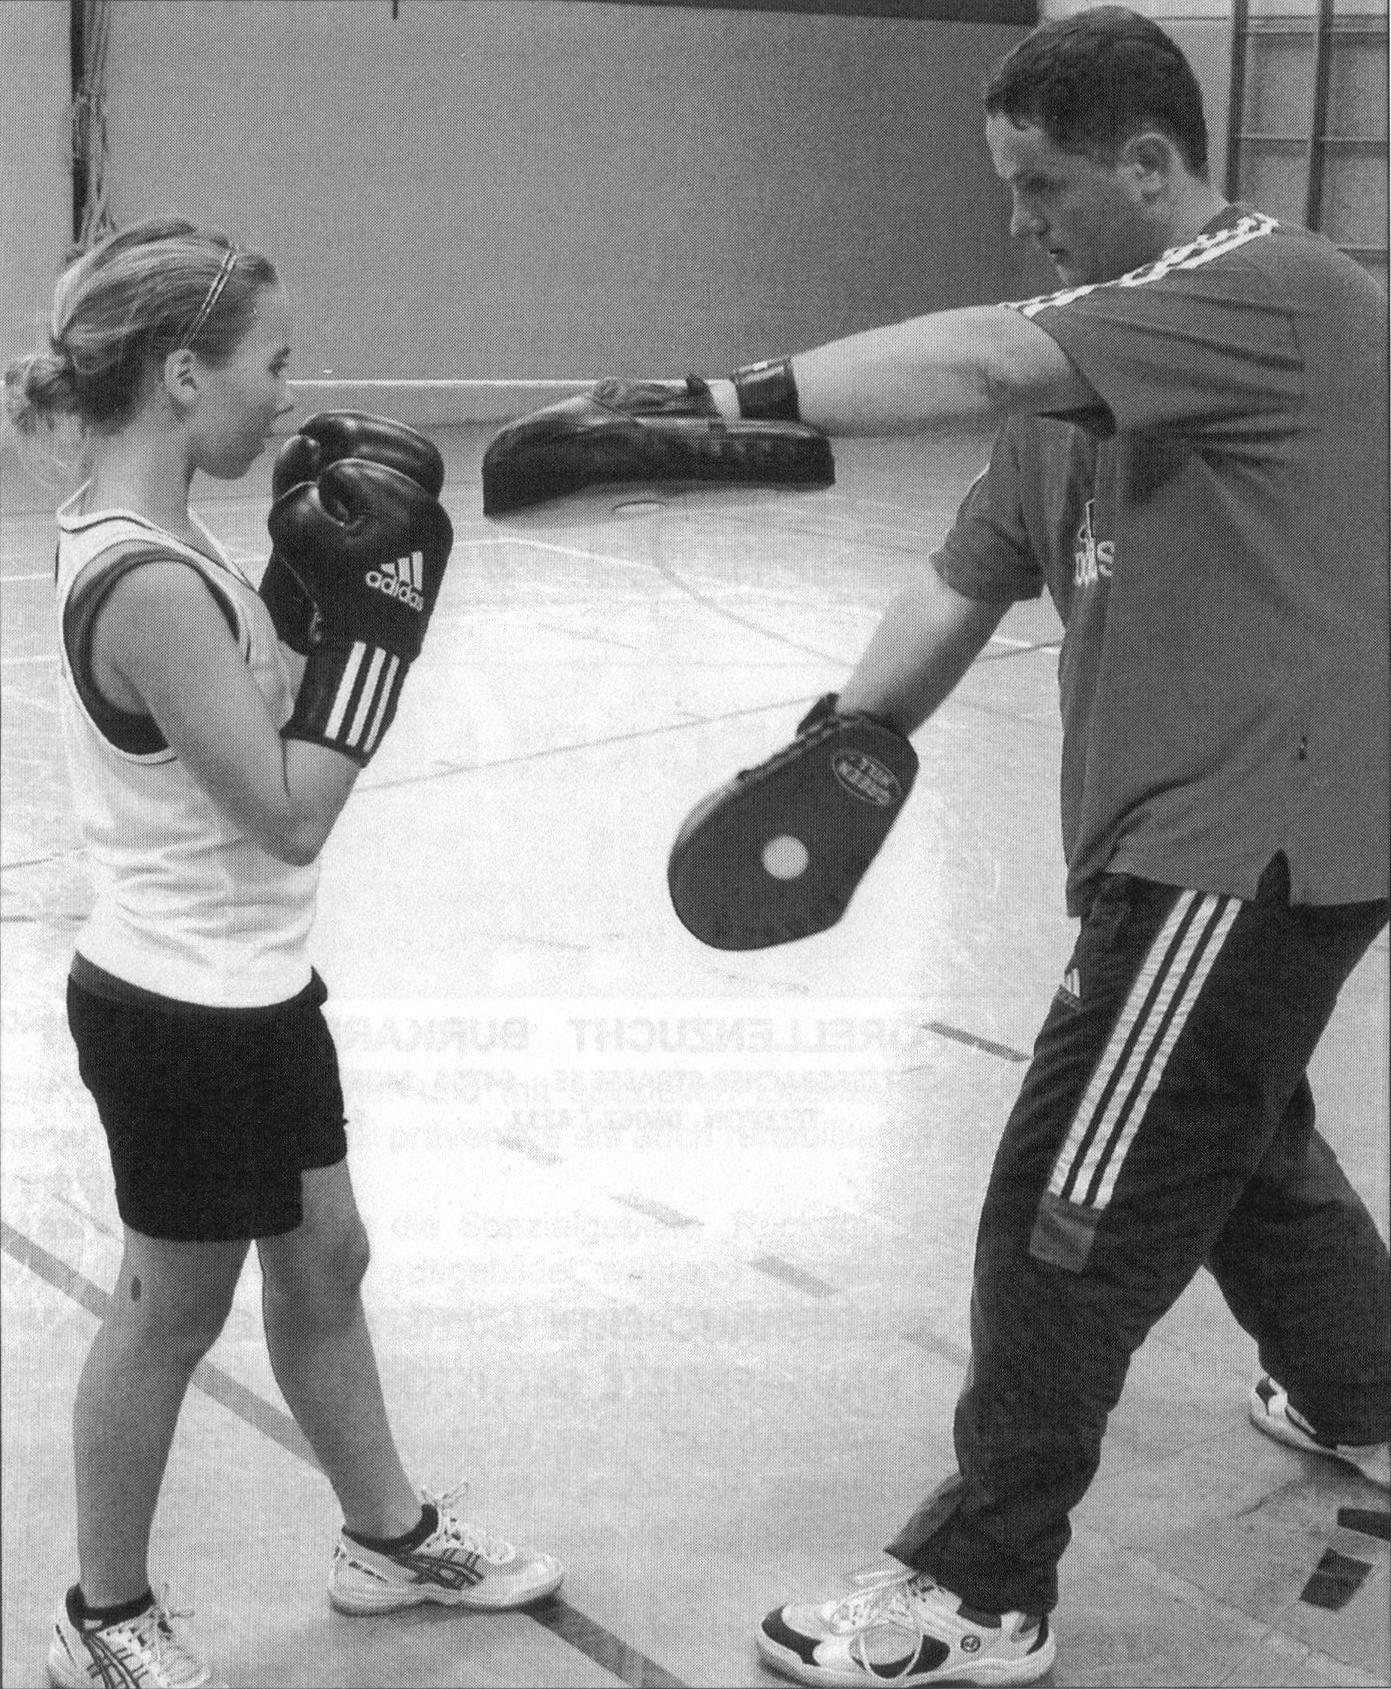 Kimberly Klingelhöfer im Training mit Viktor Peters